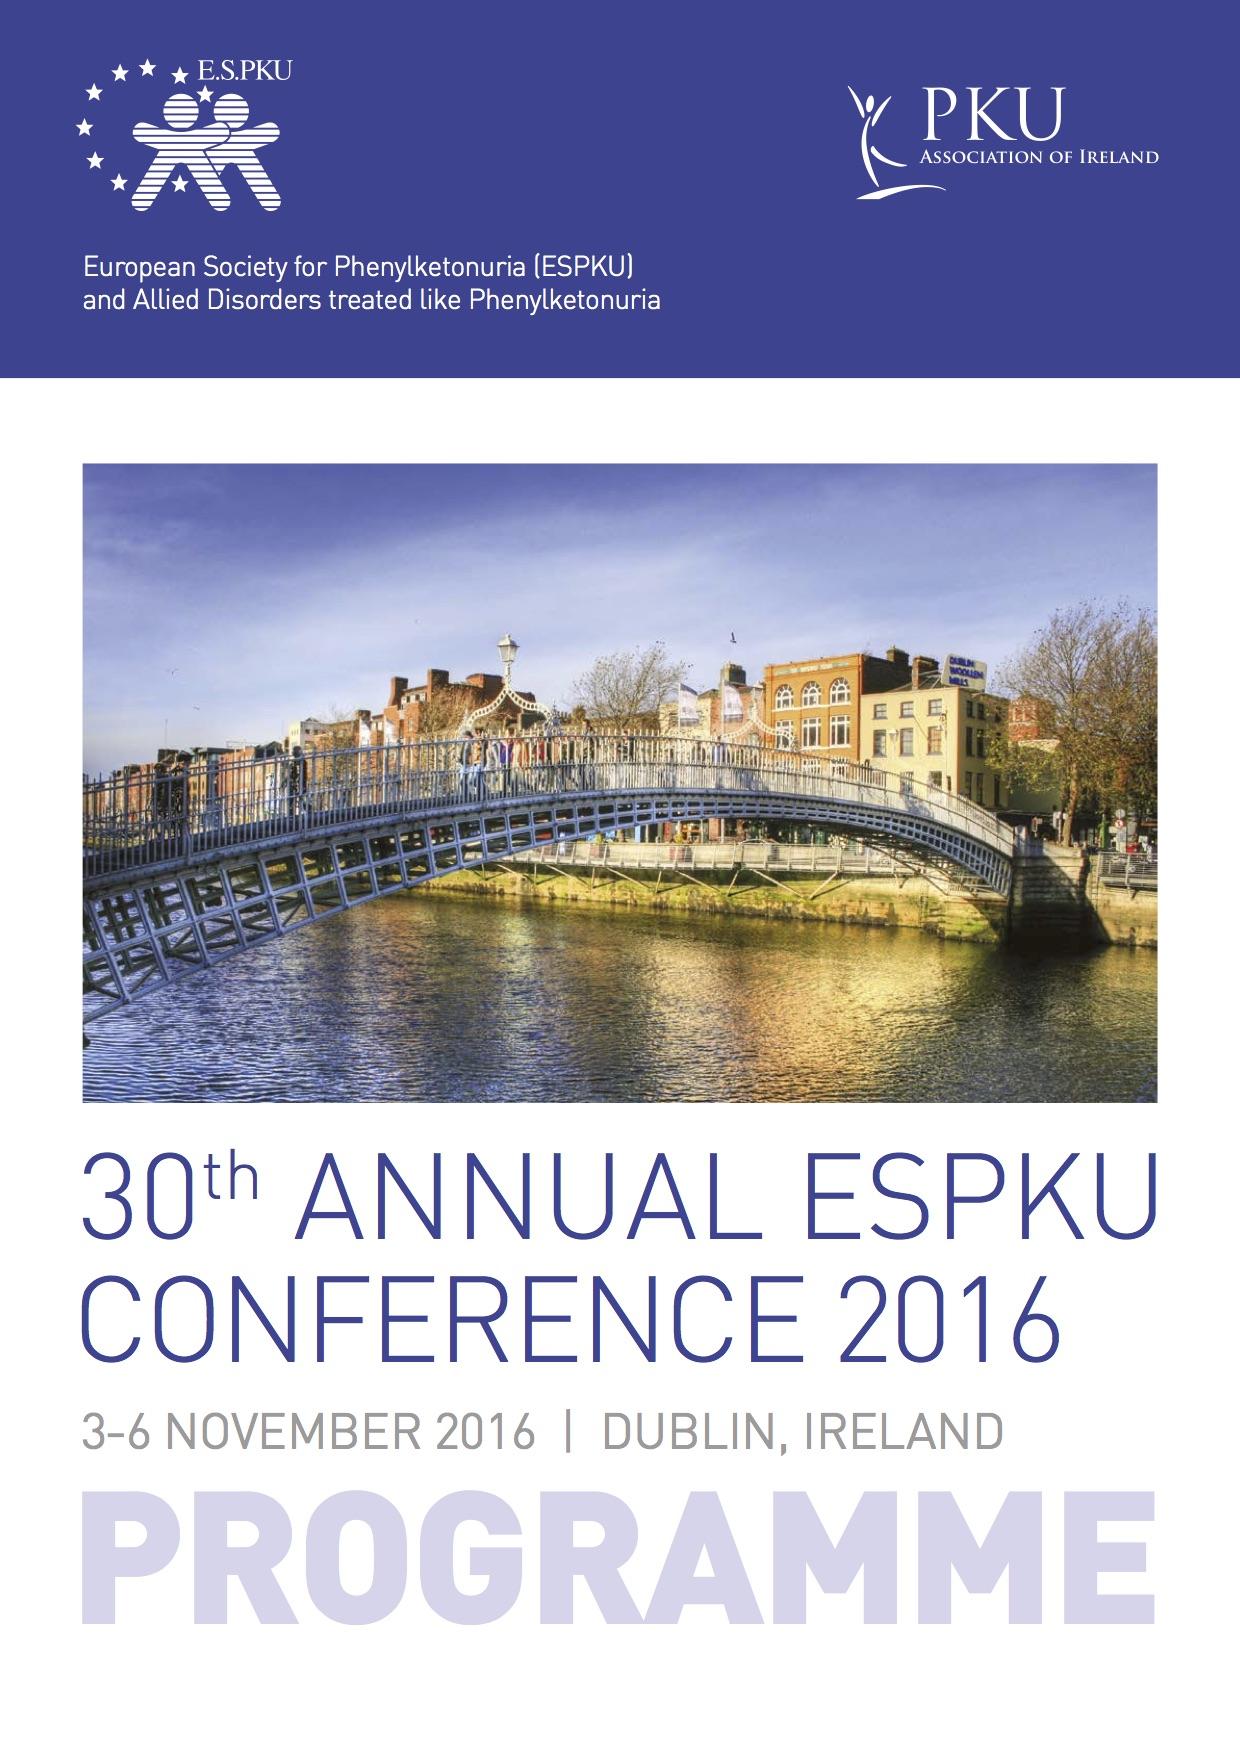 E.S.PKU Conference 2016 Programme